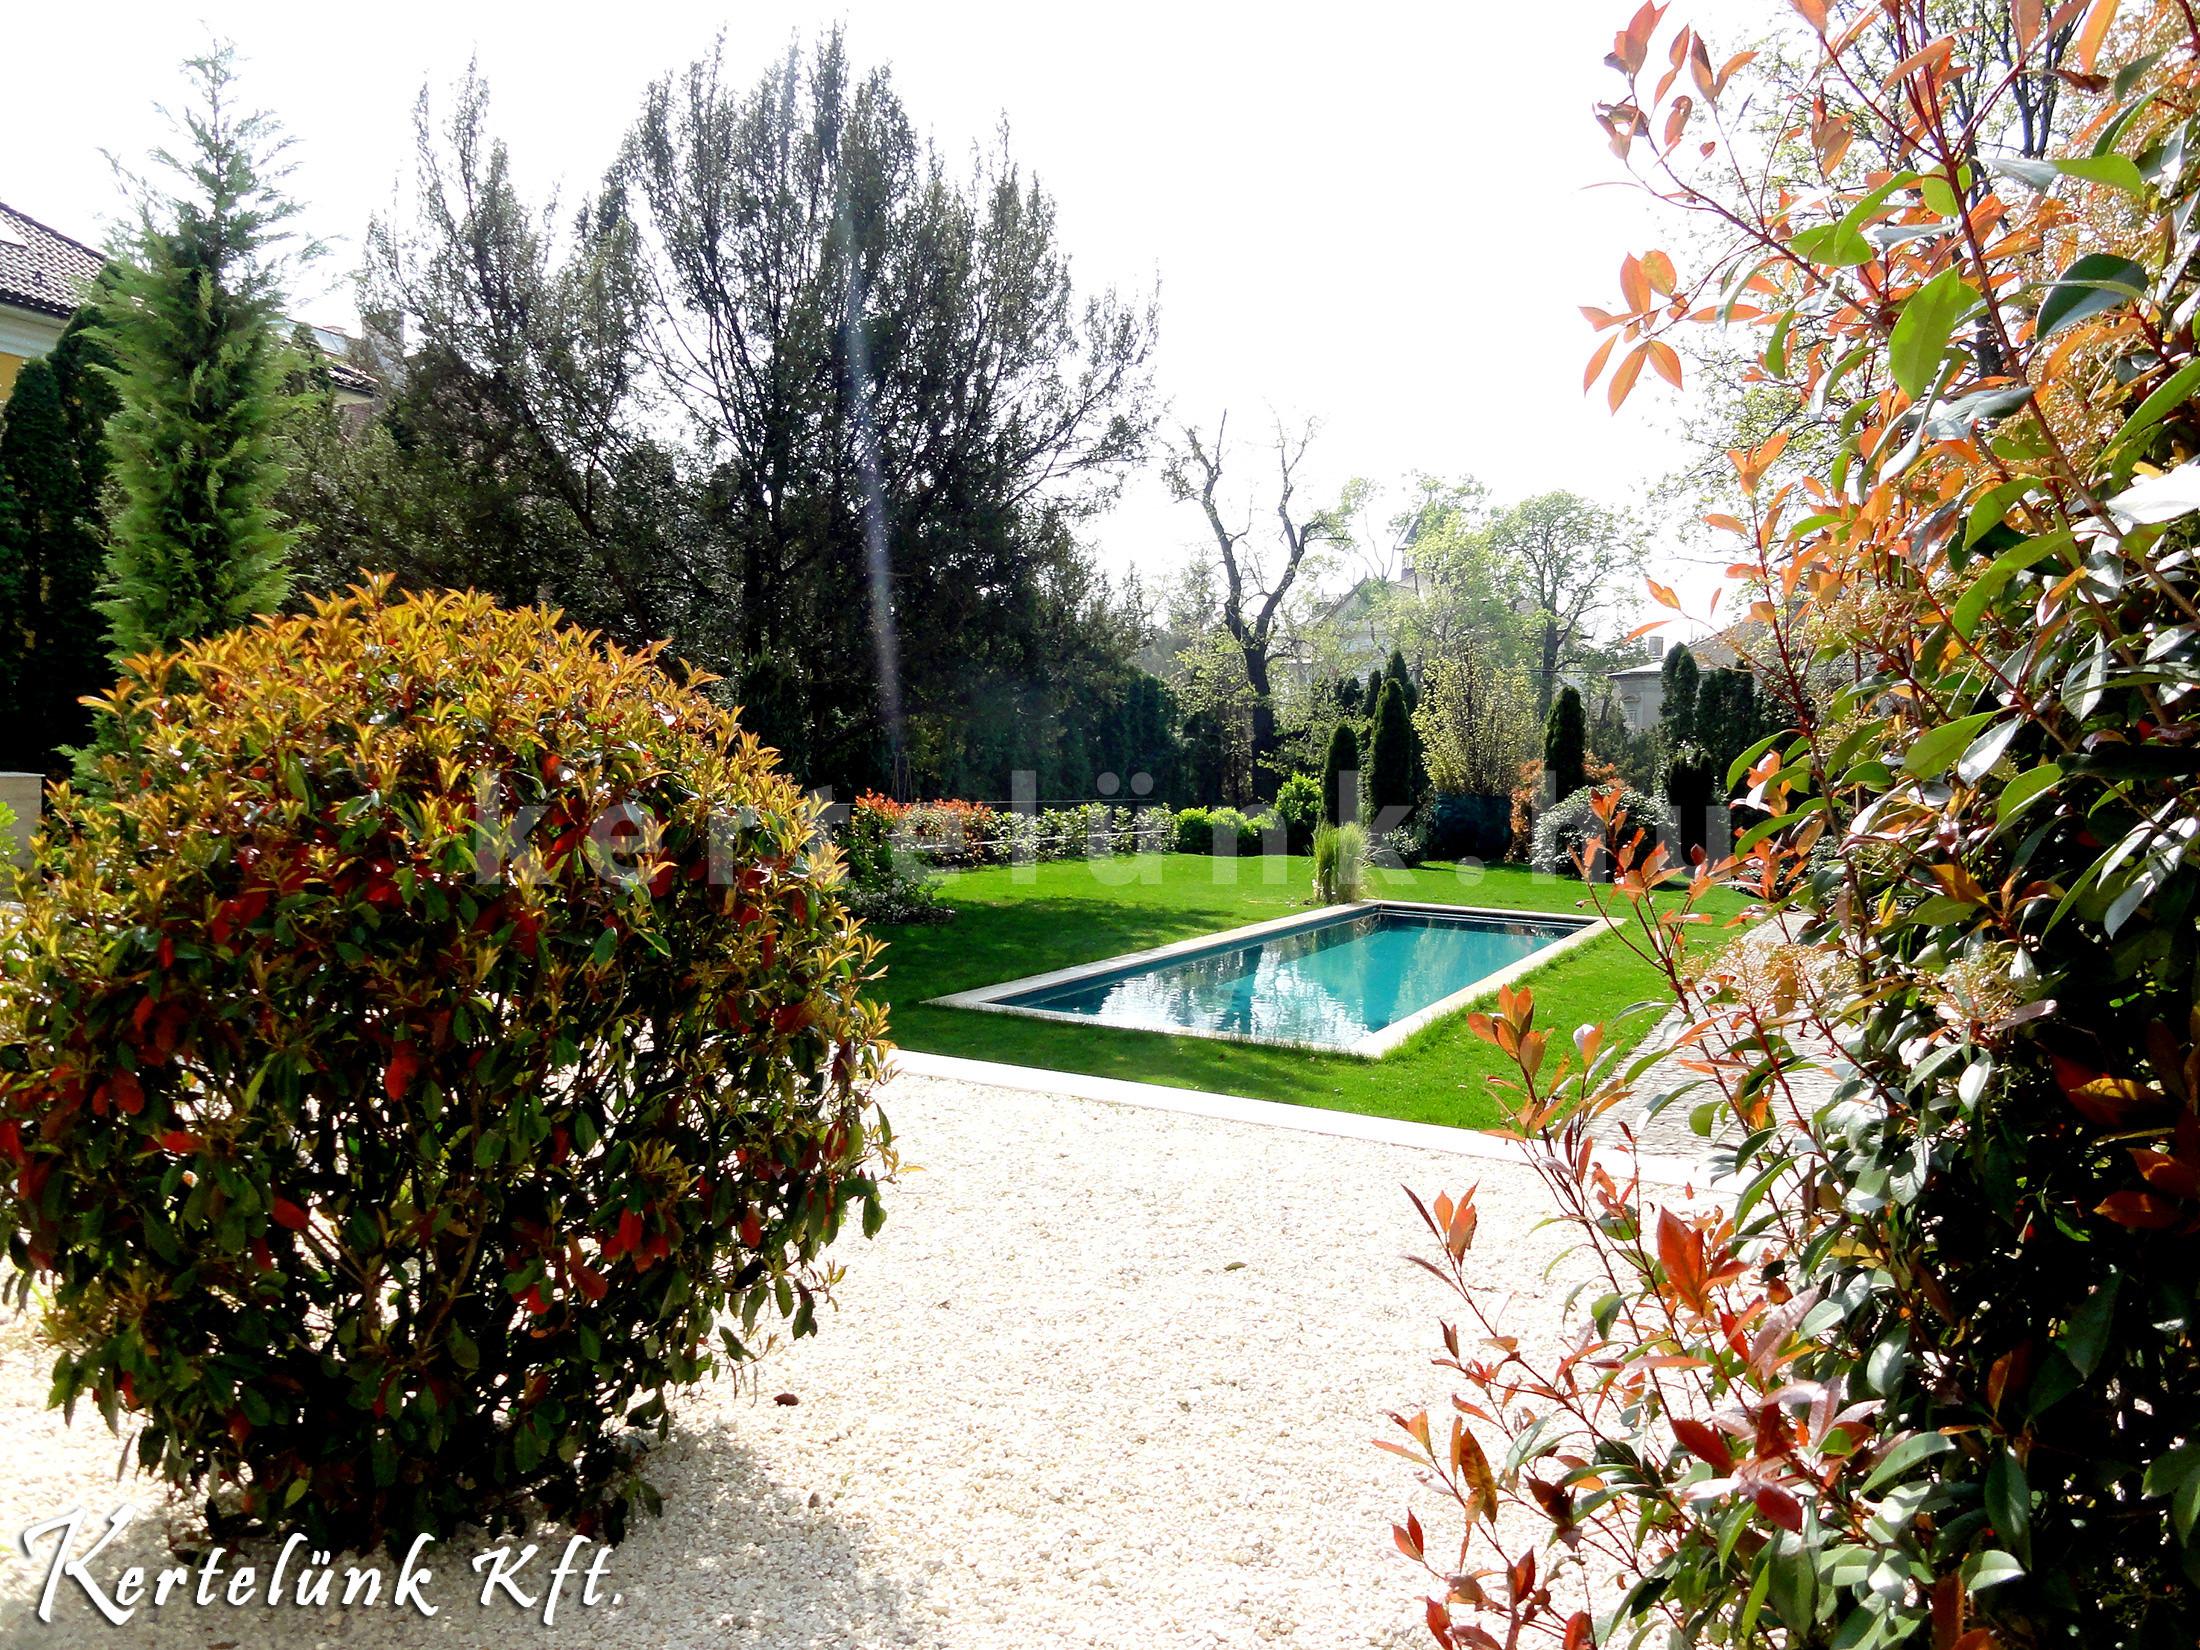 Modern kerti medence képe.